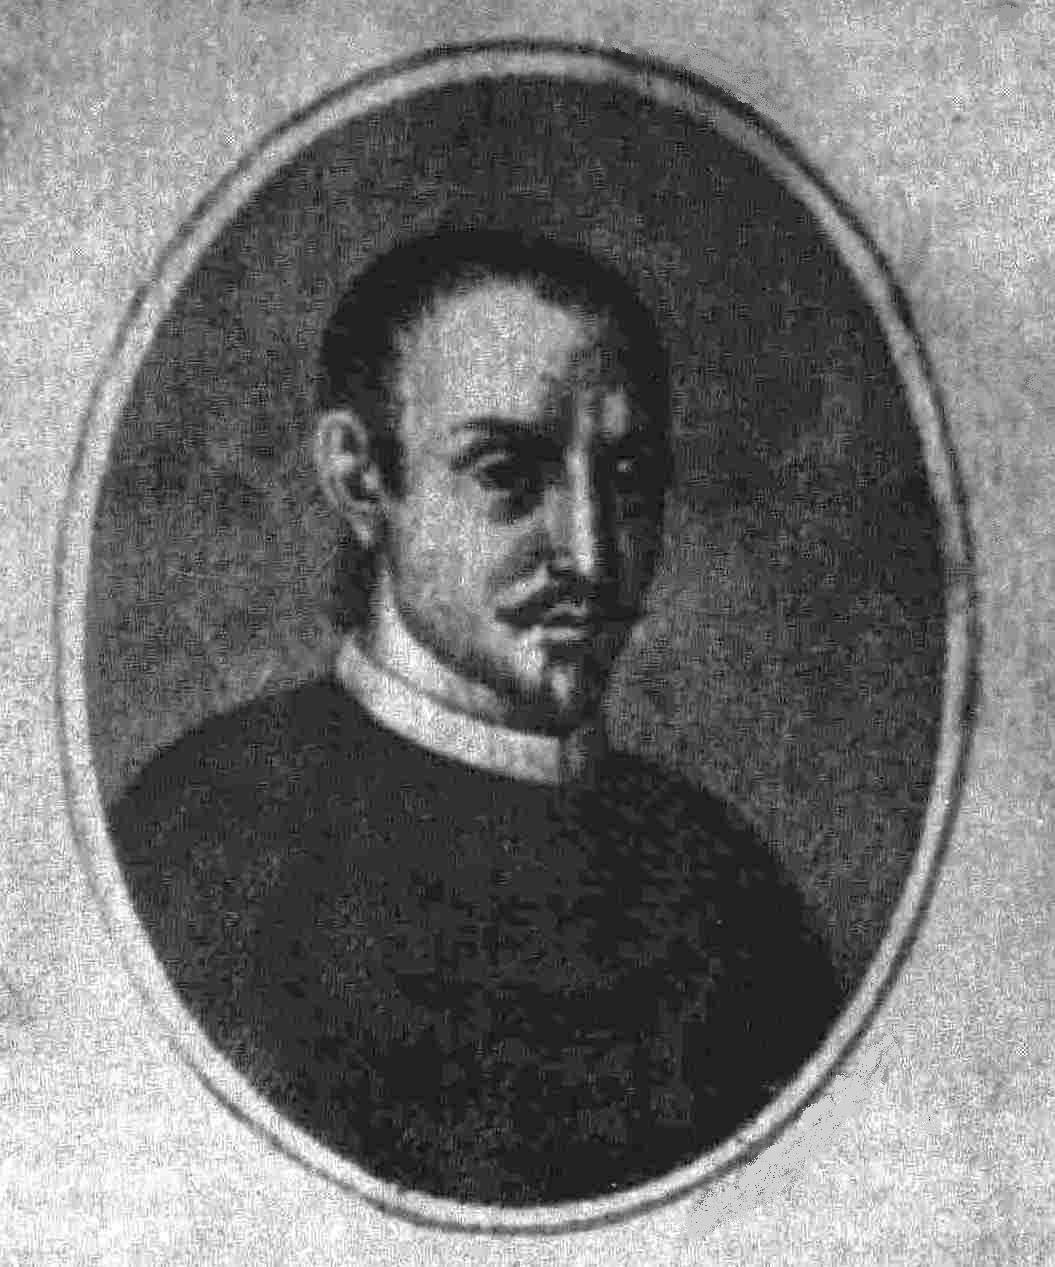 http://es.wikipedia.org/wiki/Pietro_Carrera